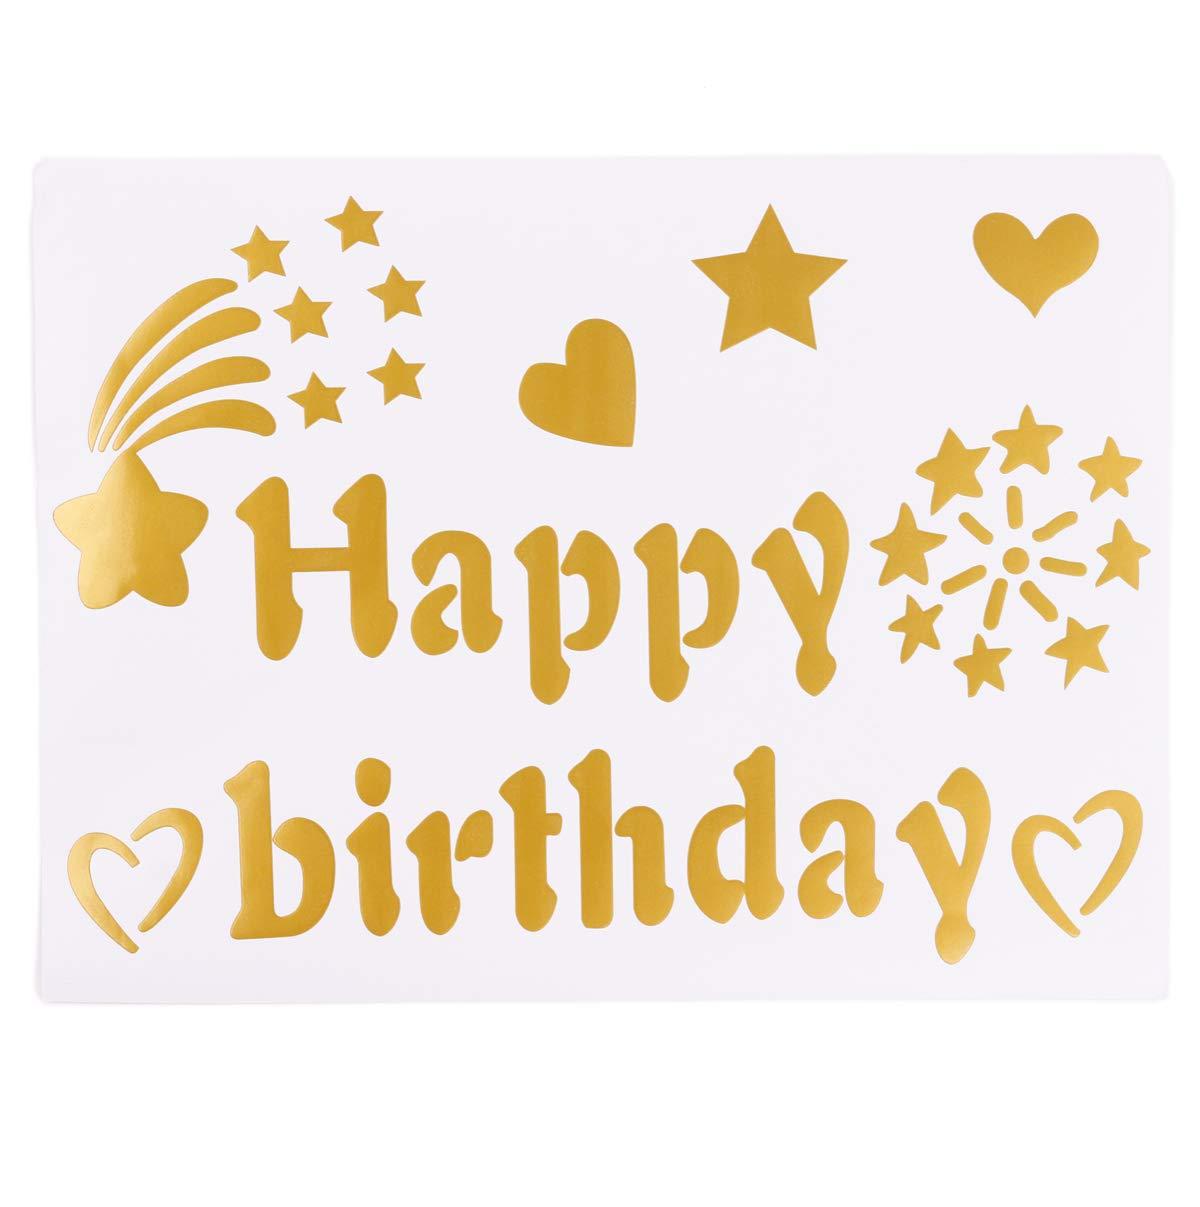 Happy Birthday Star Gold Eanjia Happy Birthday Gold Vinyl Letter Sticker for Balloon Decor Suitable Applying on Latex Balloon,Bubble Balloon 1 Sheet